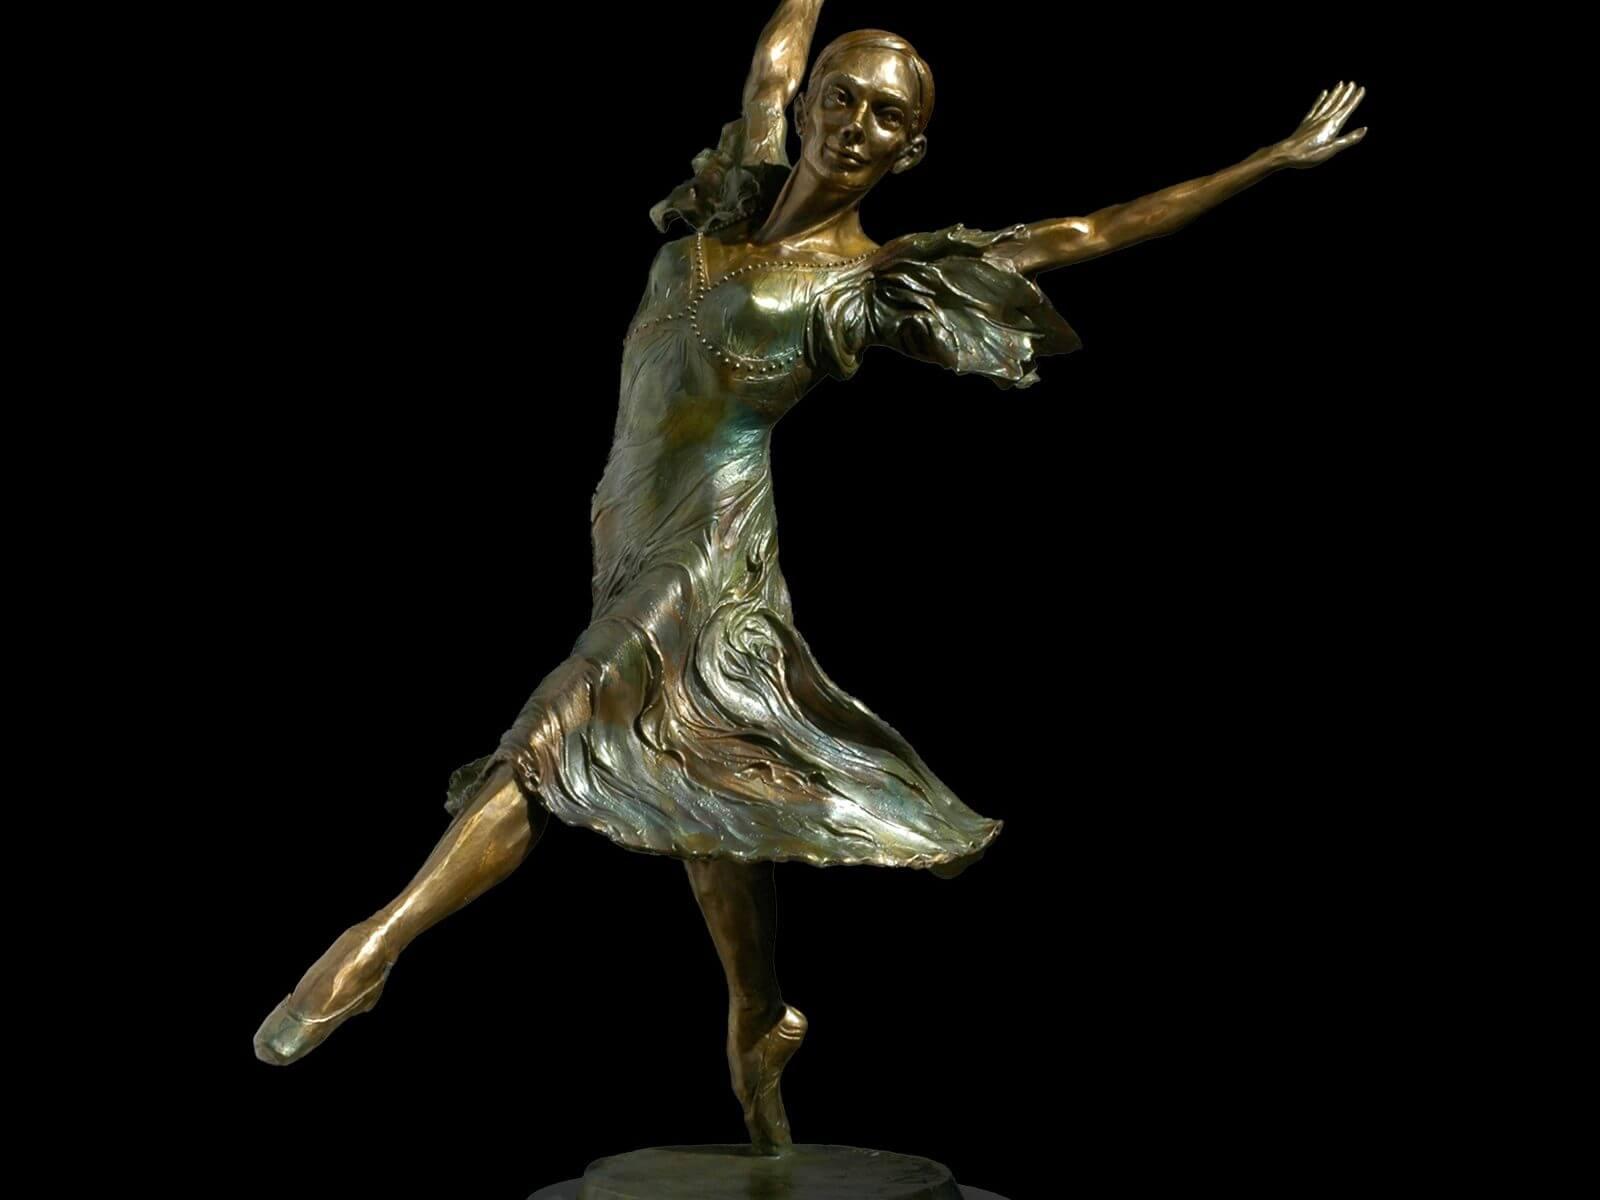 Faerie Dance a medium size ballet dancer bronze figurative sculpture by Andrew DeVries commissioned by Martha Grace